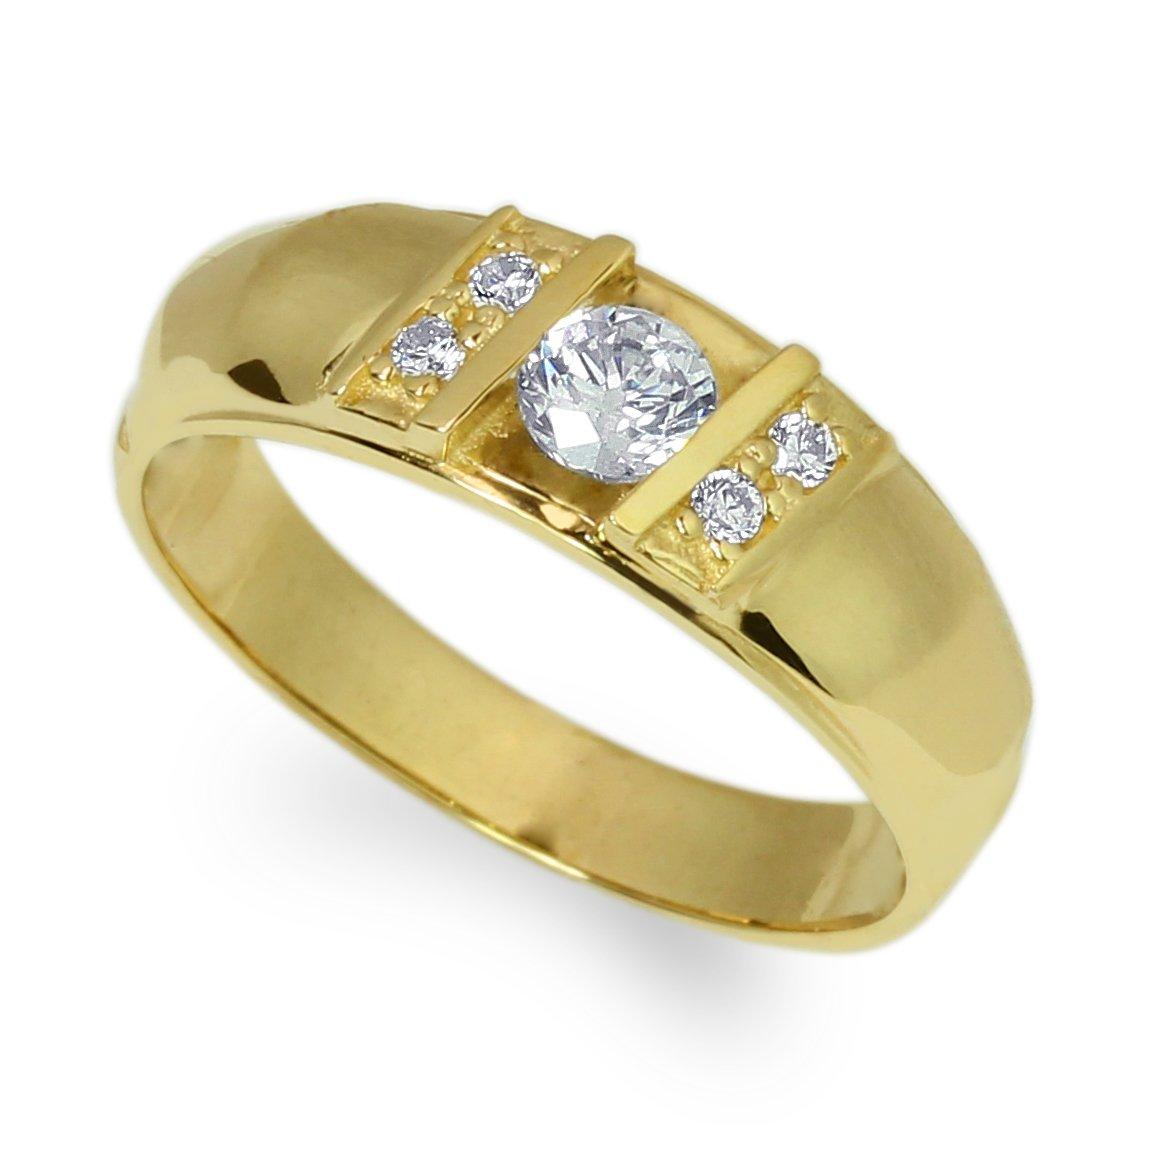 JamesJenny Mens 14K Yellow Gold Round CZ Unique Stylish Ring Size 7-12